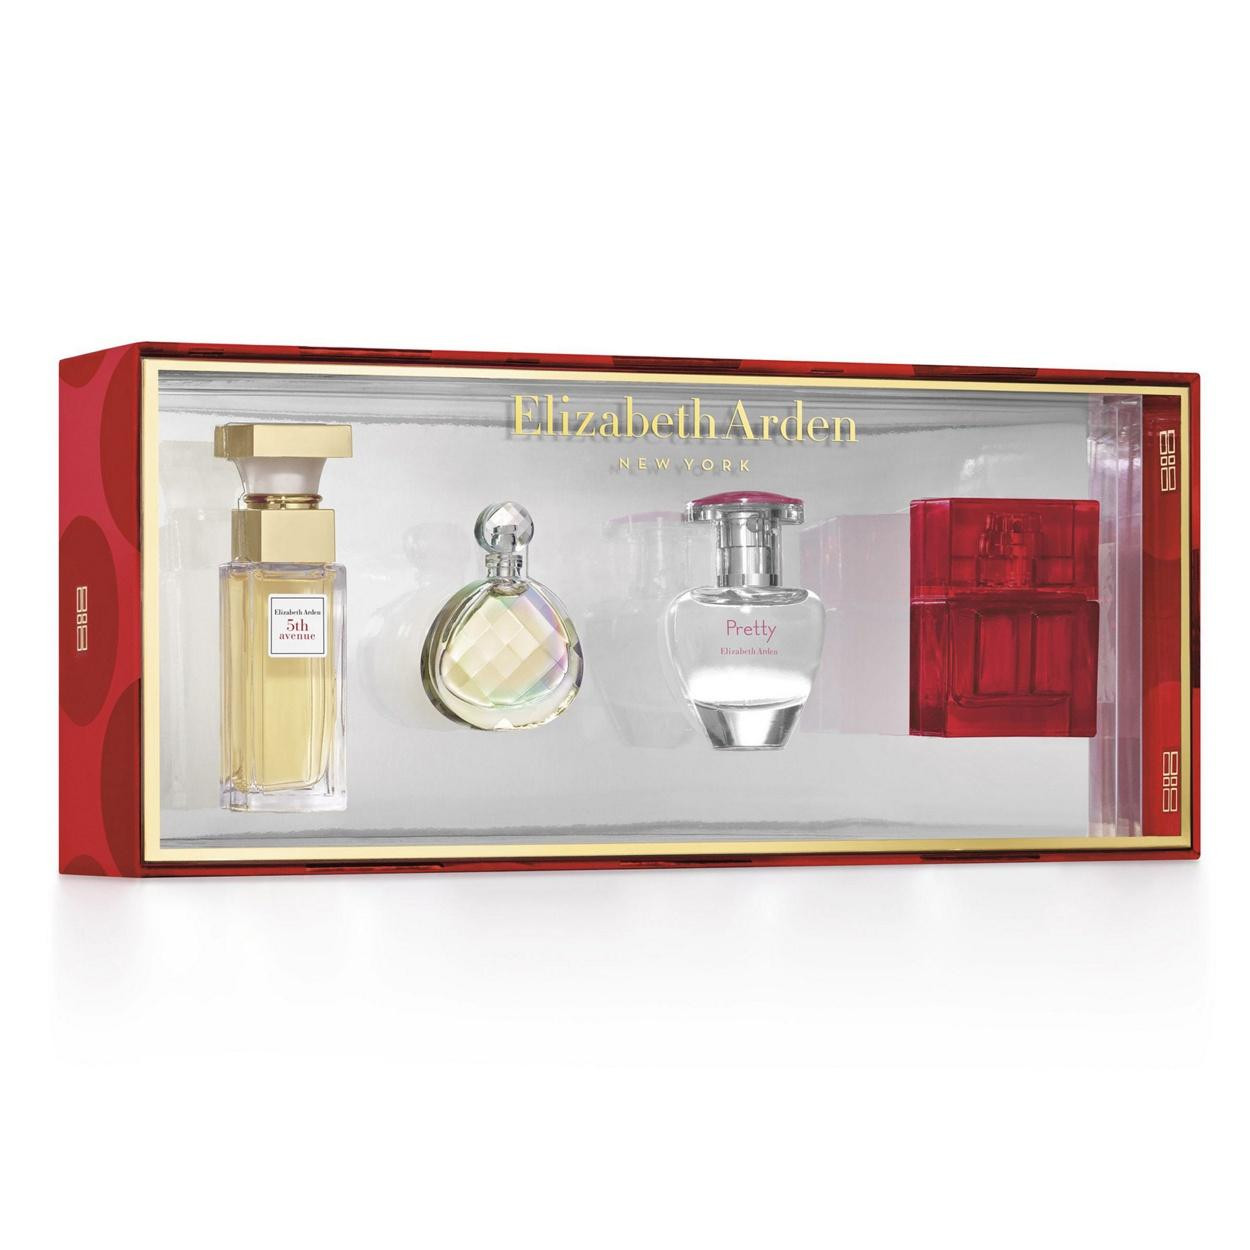 Elizabeth Arden Fifth Avenue Perfume